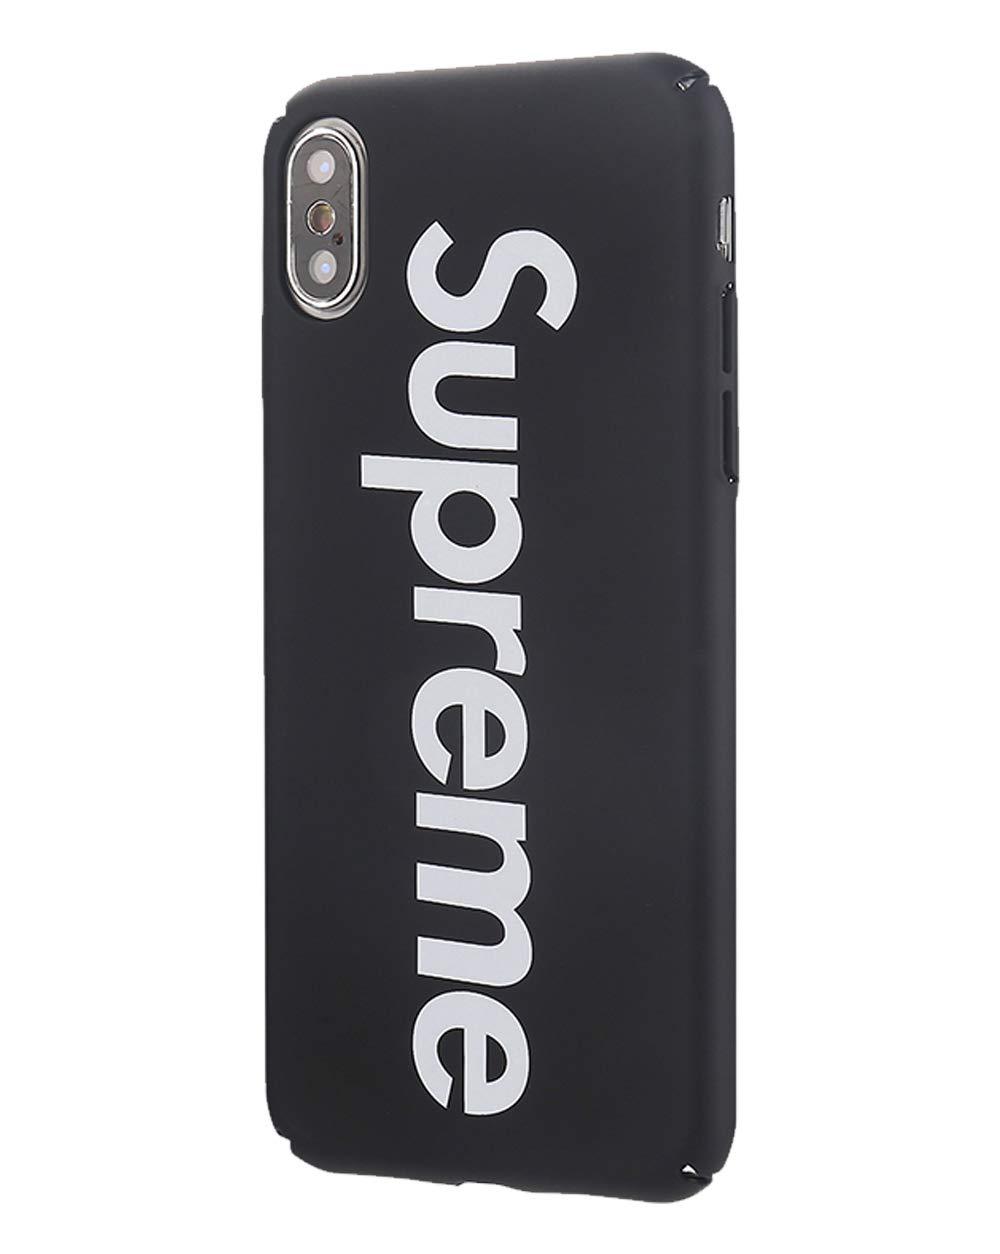 Adatto per Apple iPhone 6 Plus, Rosso Custodia prossoettiva di ...